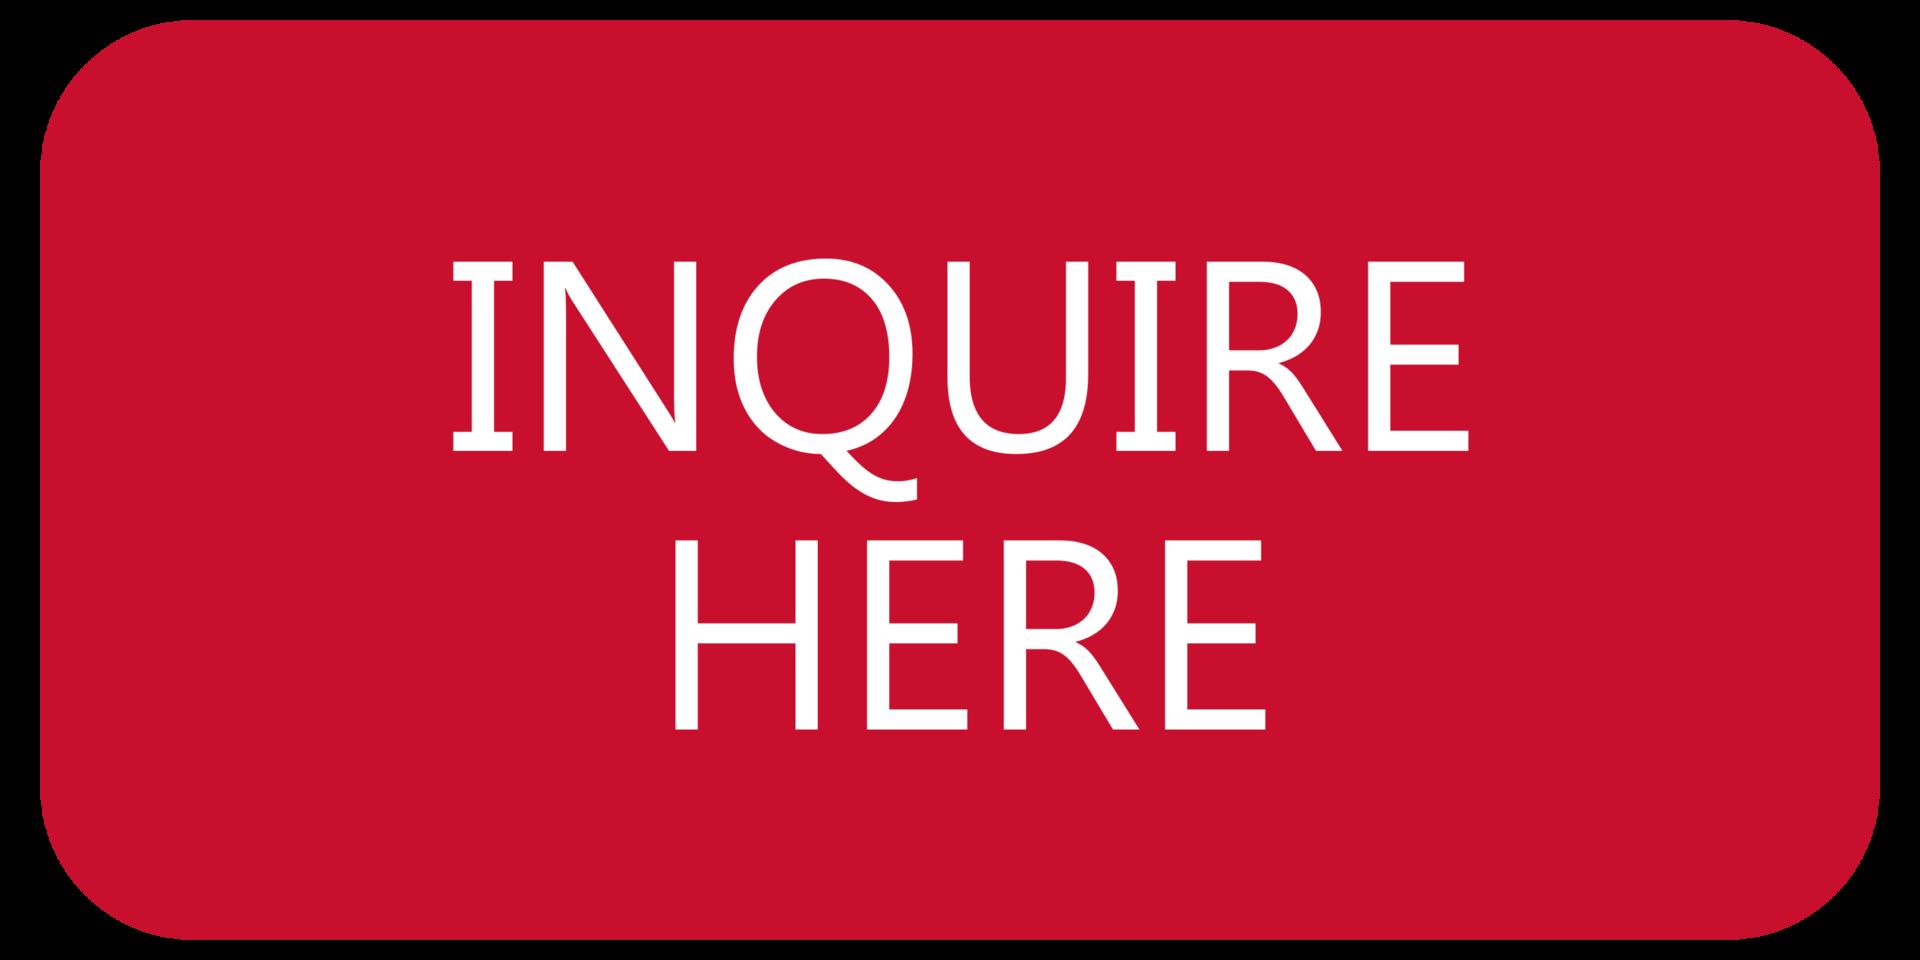 Inquire Here